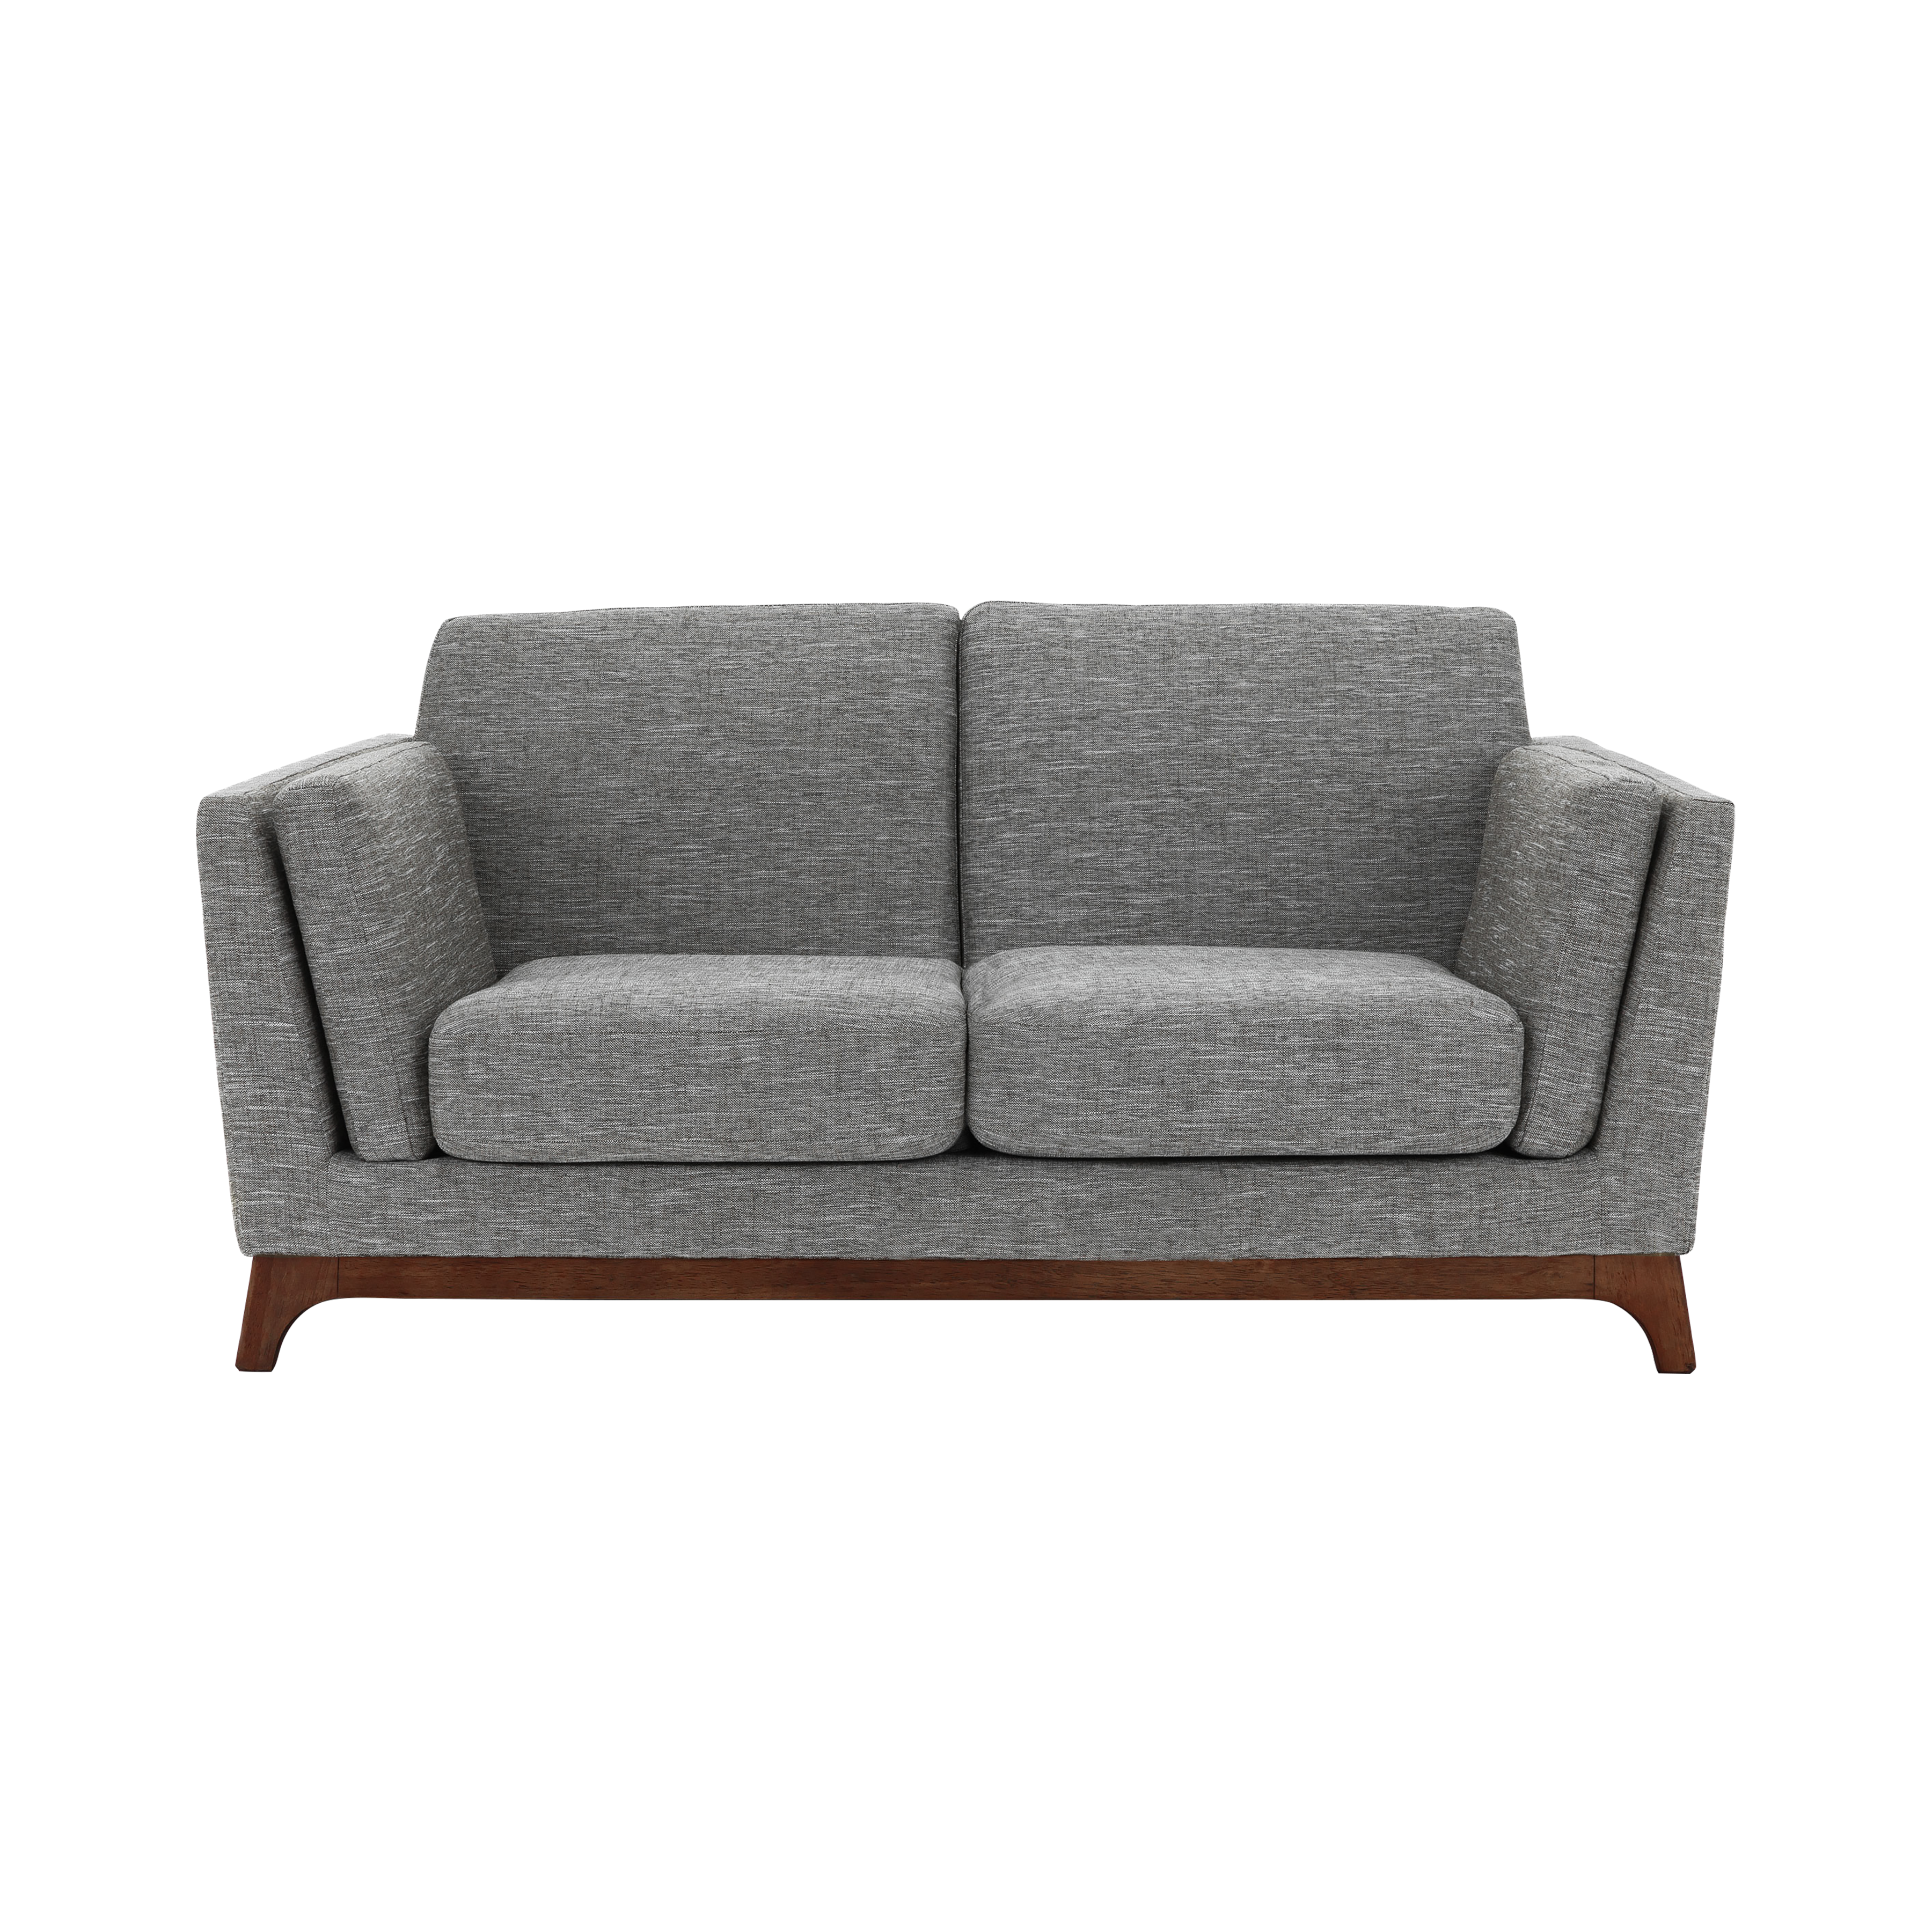 Swell Elijah Loveseat Pebble Fabric Cocoa Pebble In 2019 Cjindustries Chair Design For Home Cjindustriesco